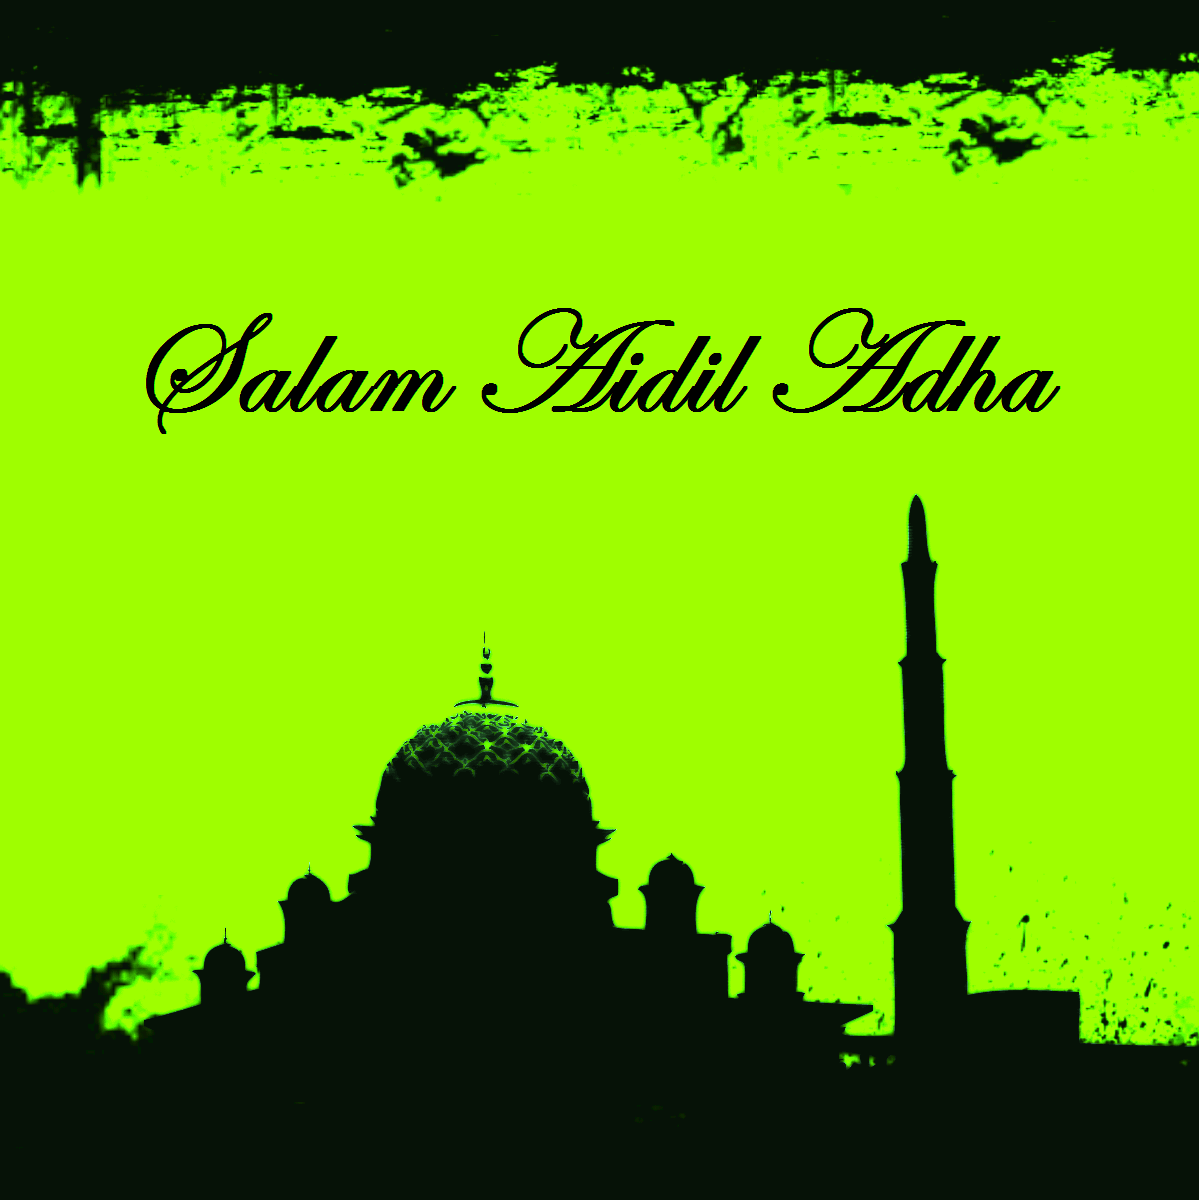 Wishing All Muslim A Happy Hari Raya Haji. - Hari Raya Haji, Transparent background PNG HD thumbnail